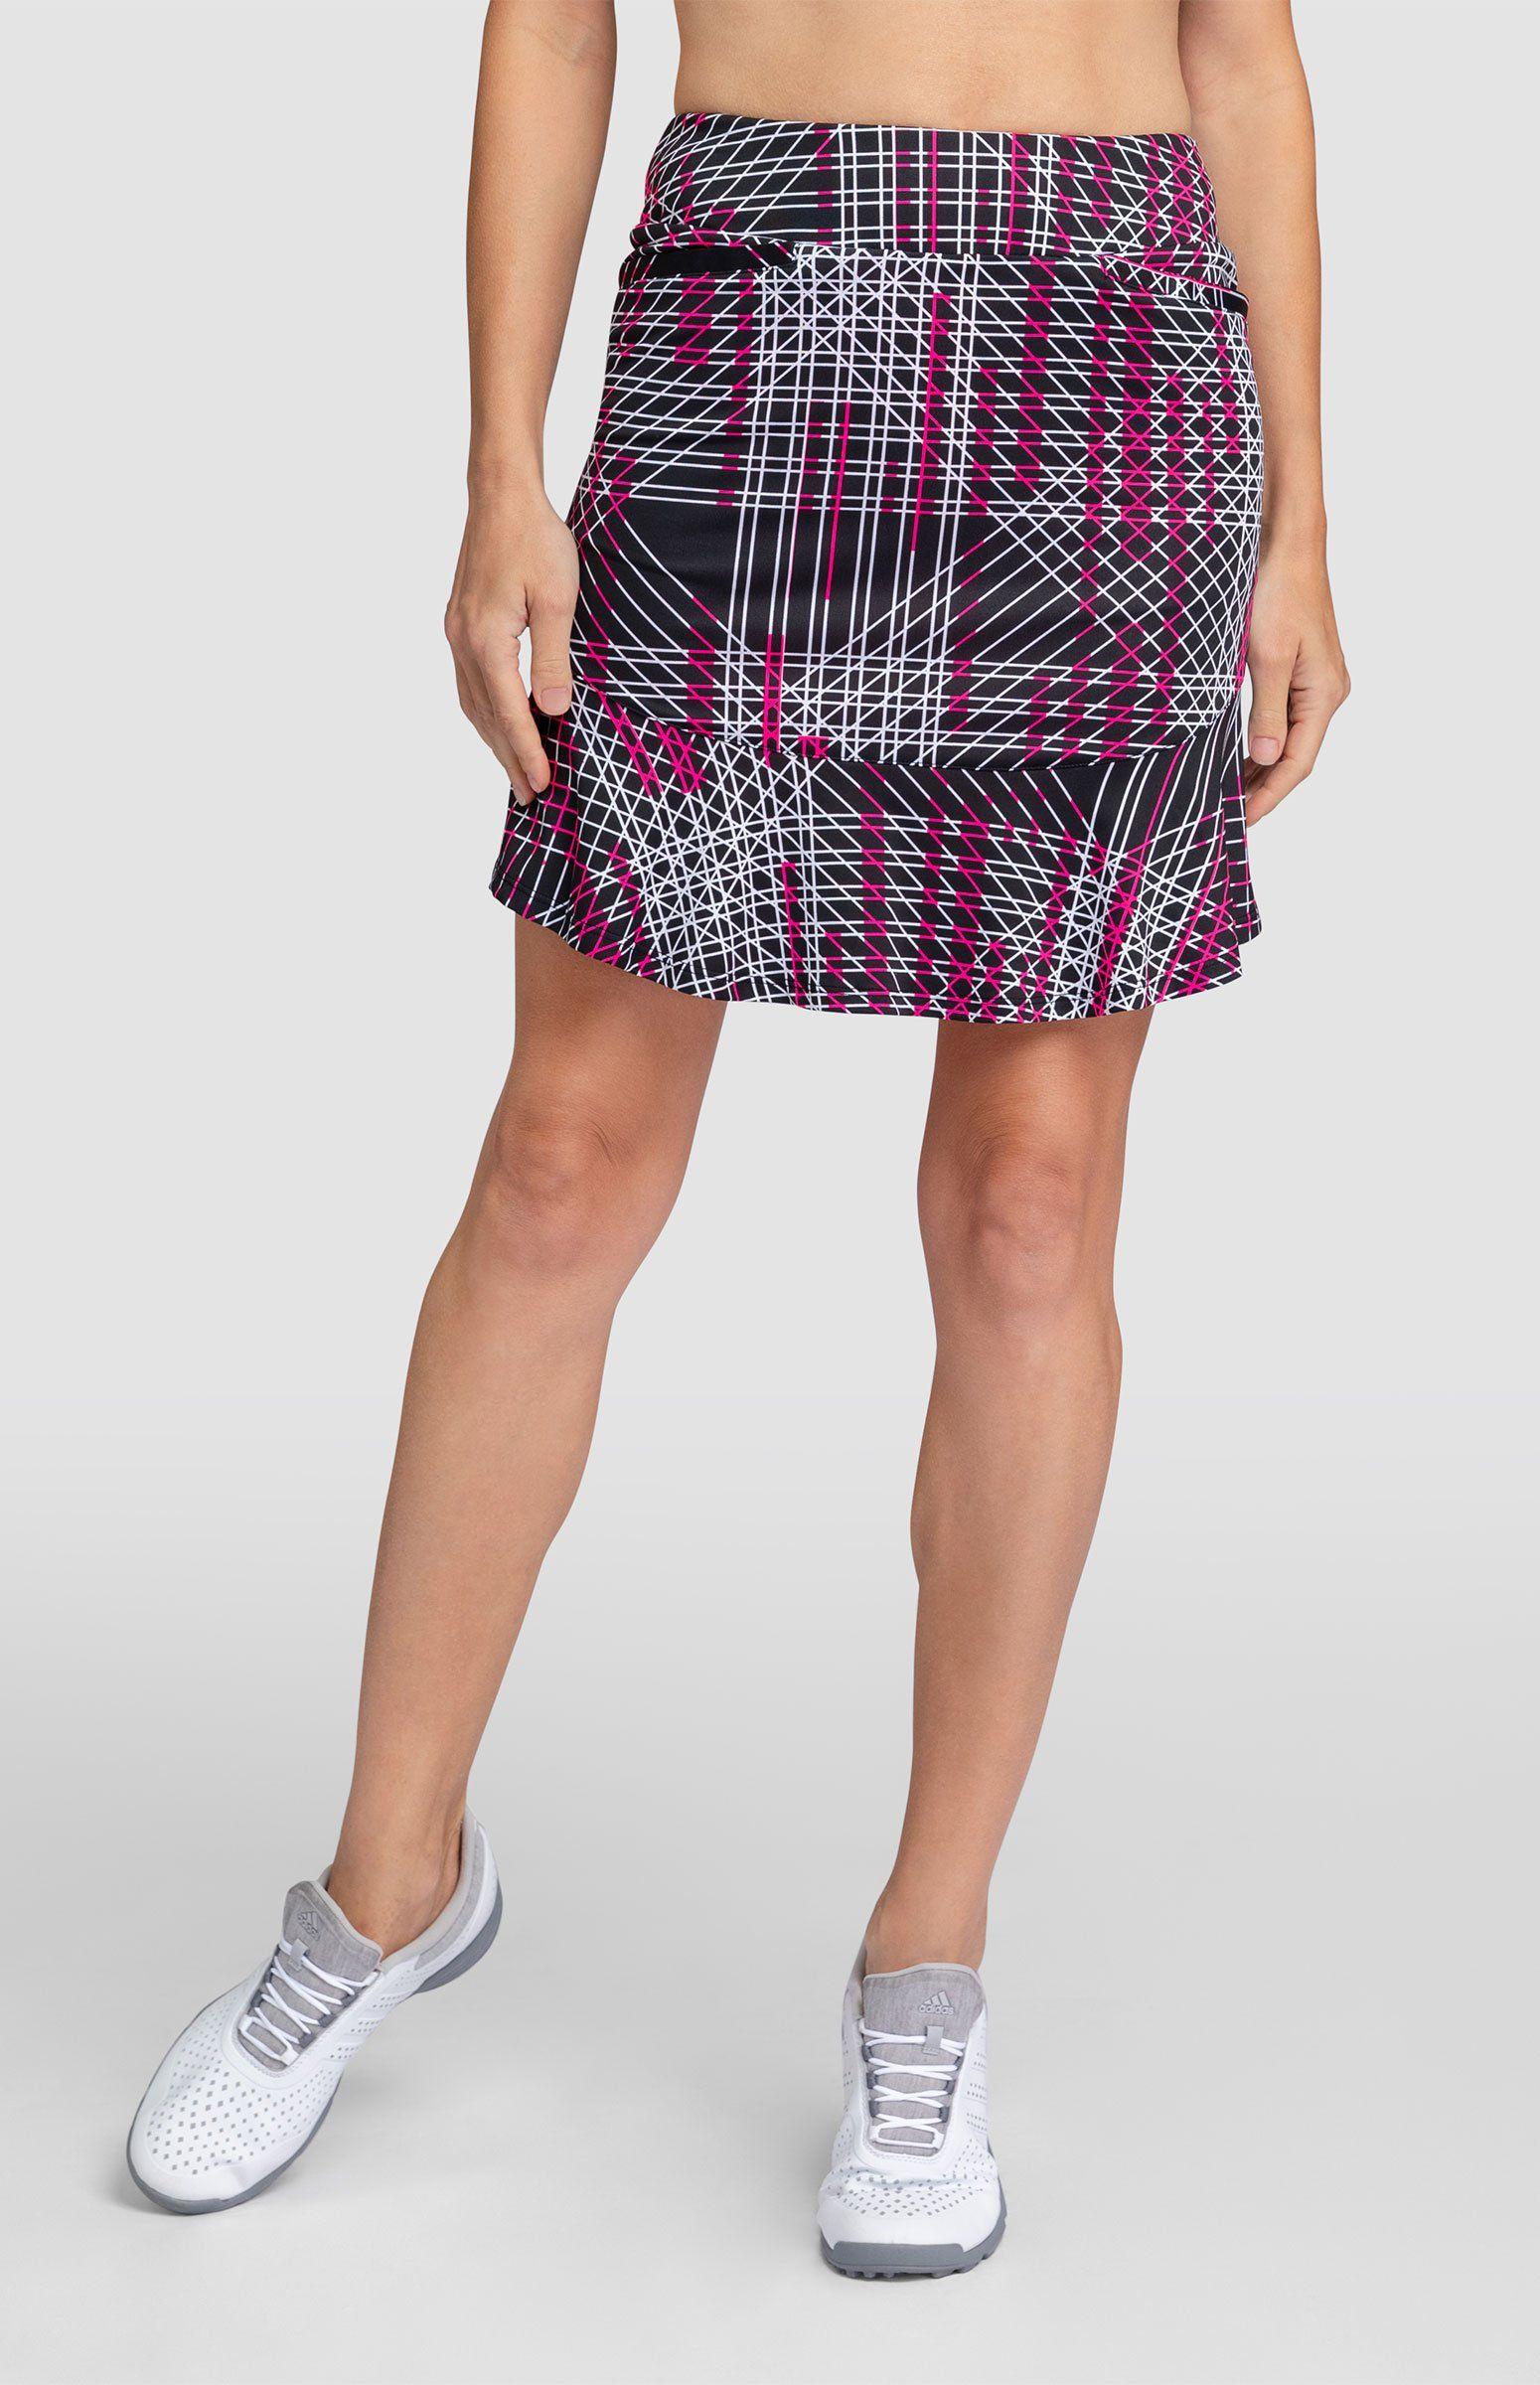 Chester Skort Berry Sorbet For Golf Tail Activewear Women S Golf Fashion Apparel Golf Outfits Women Golf Dresses Golf Attire